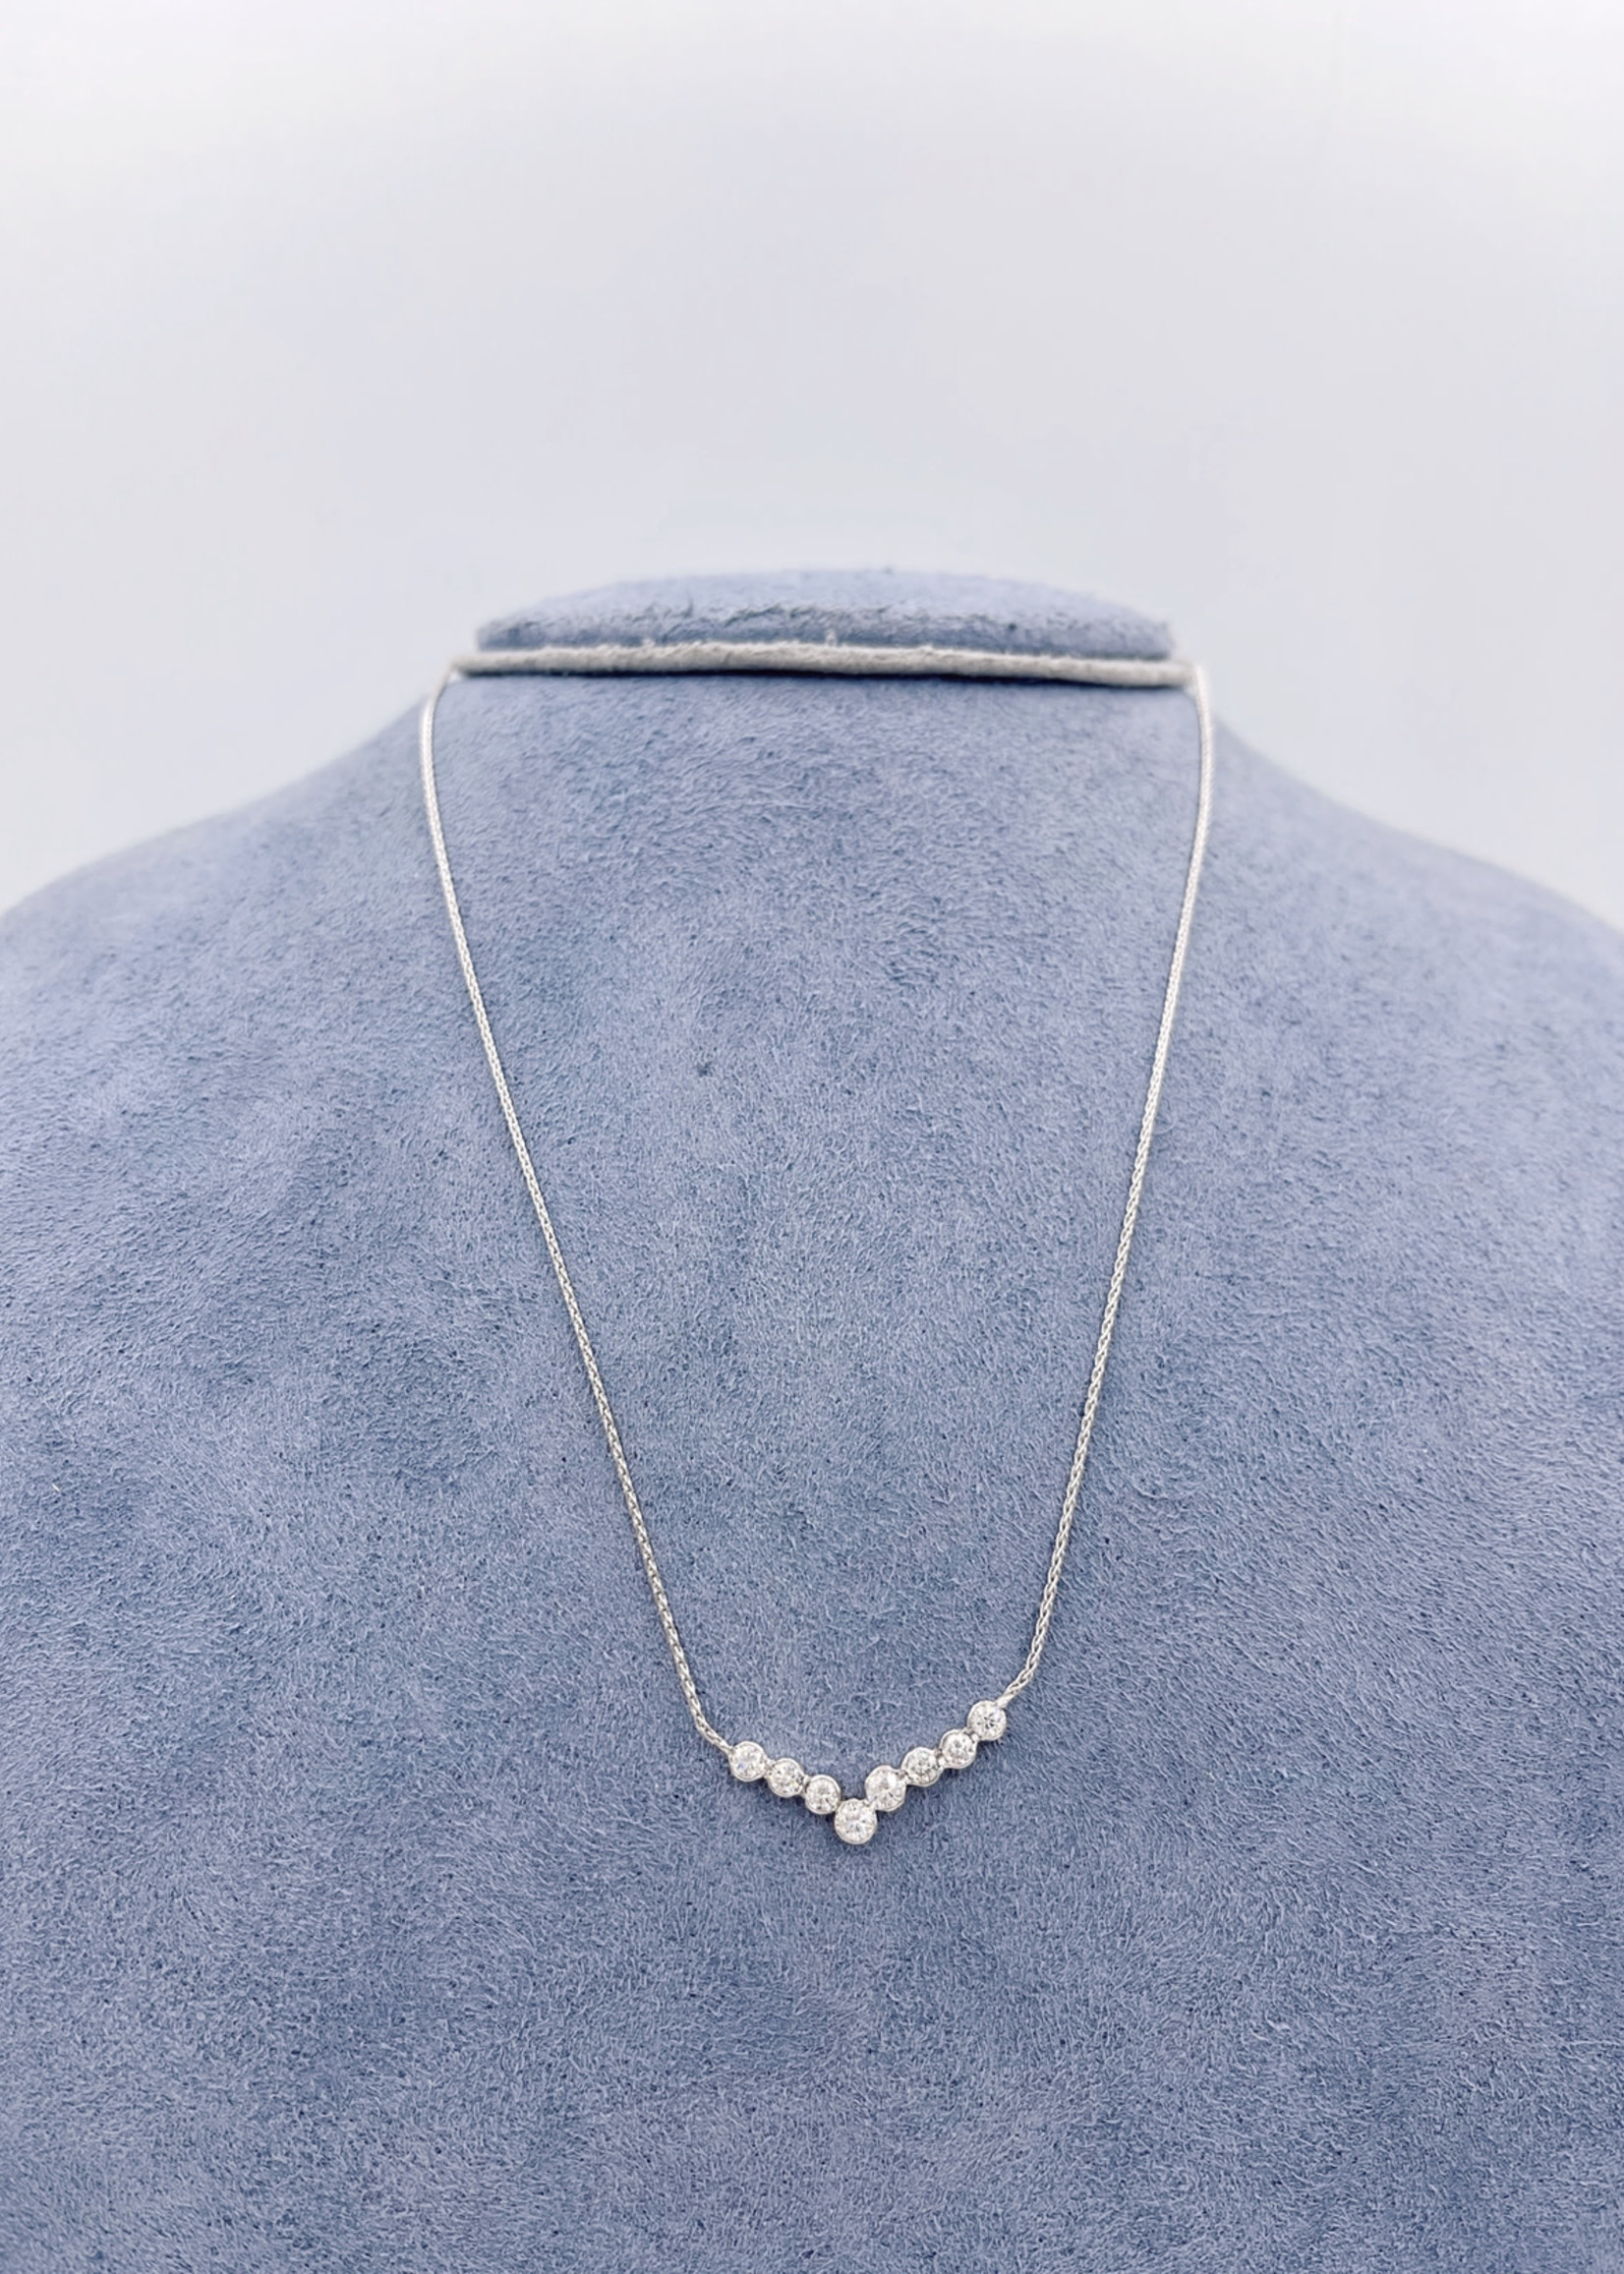 CJ Designs Diamond Necklace 14k White